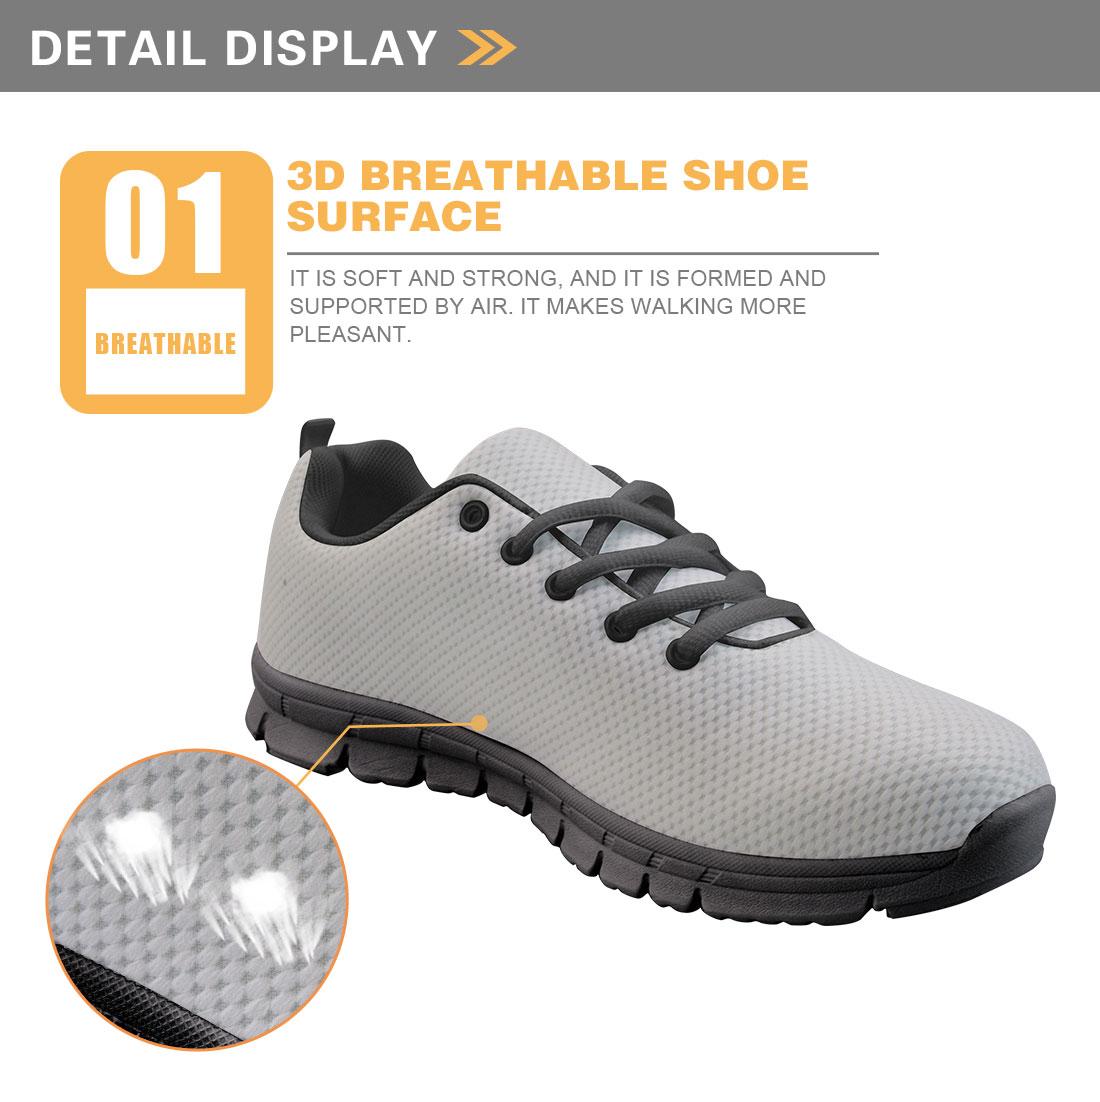 b up customized Air Femmes Vulcanisé Casual En t0503aq b Graffiti Forudesigns Chaussures Impression Dentelle Confortable D'été Plein b b Mode 3d T0495aq t0506aq t0501aq t500aq b b Plat Sneakers xPRxZcqpwI